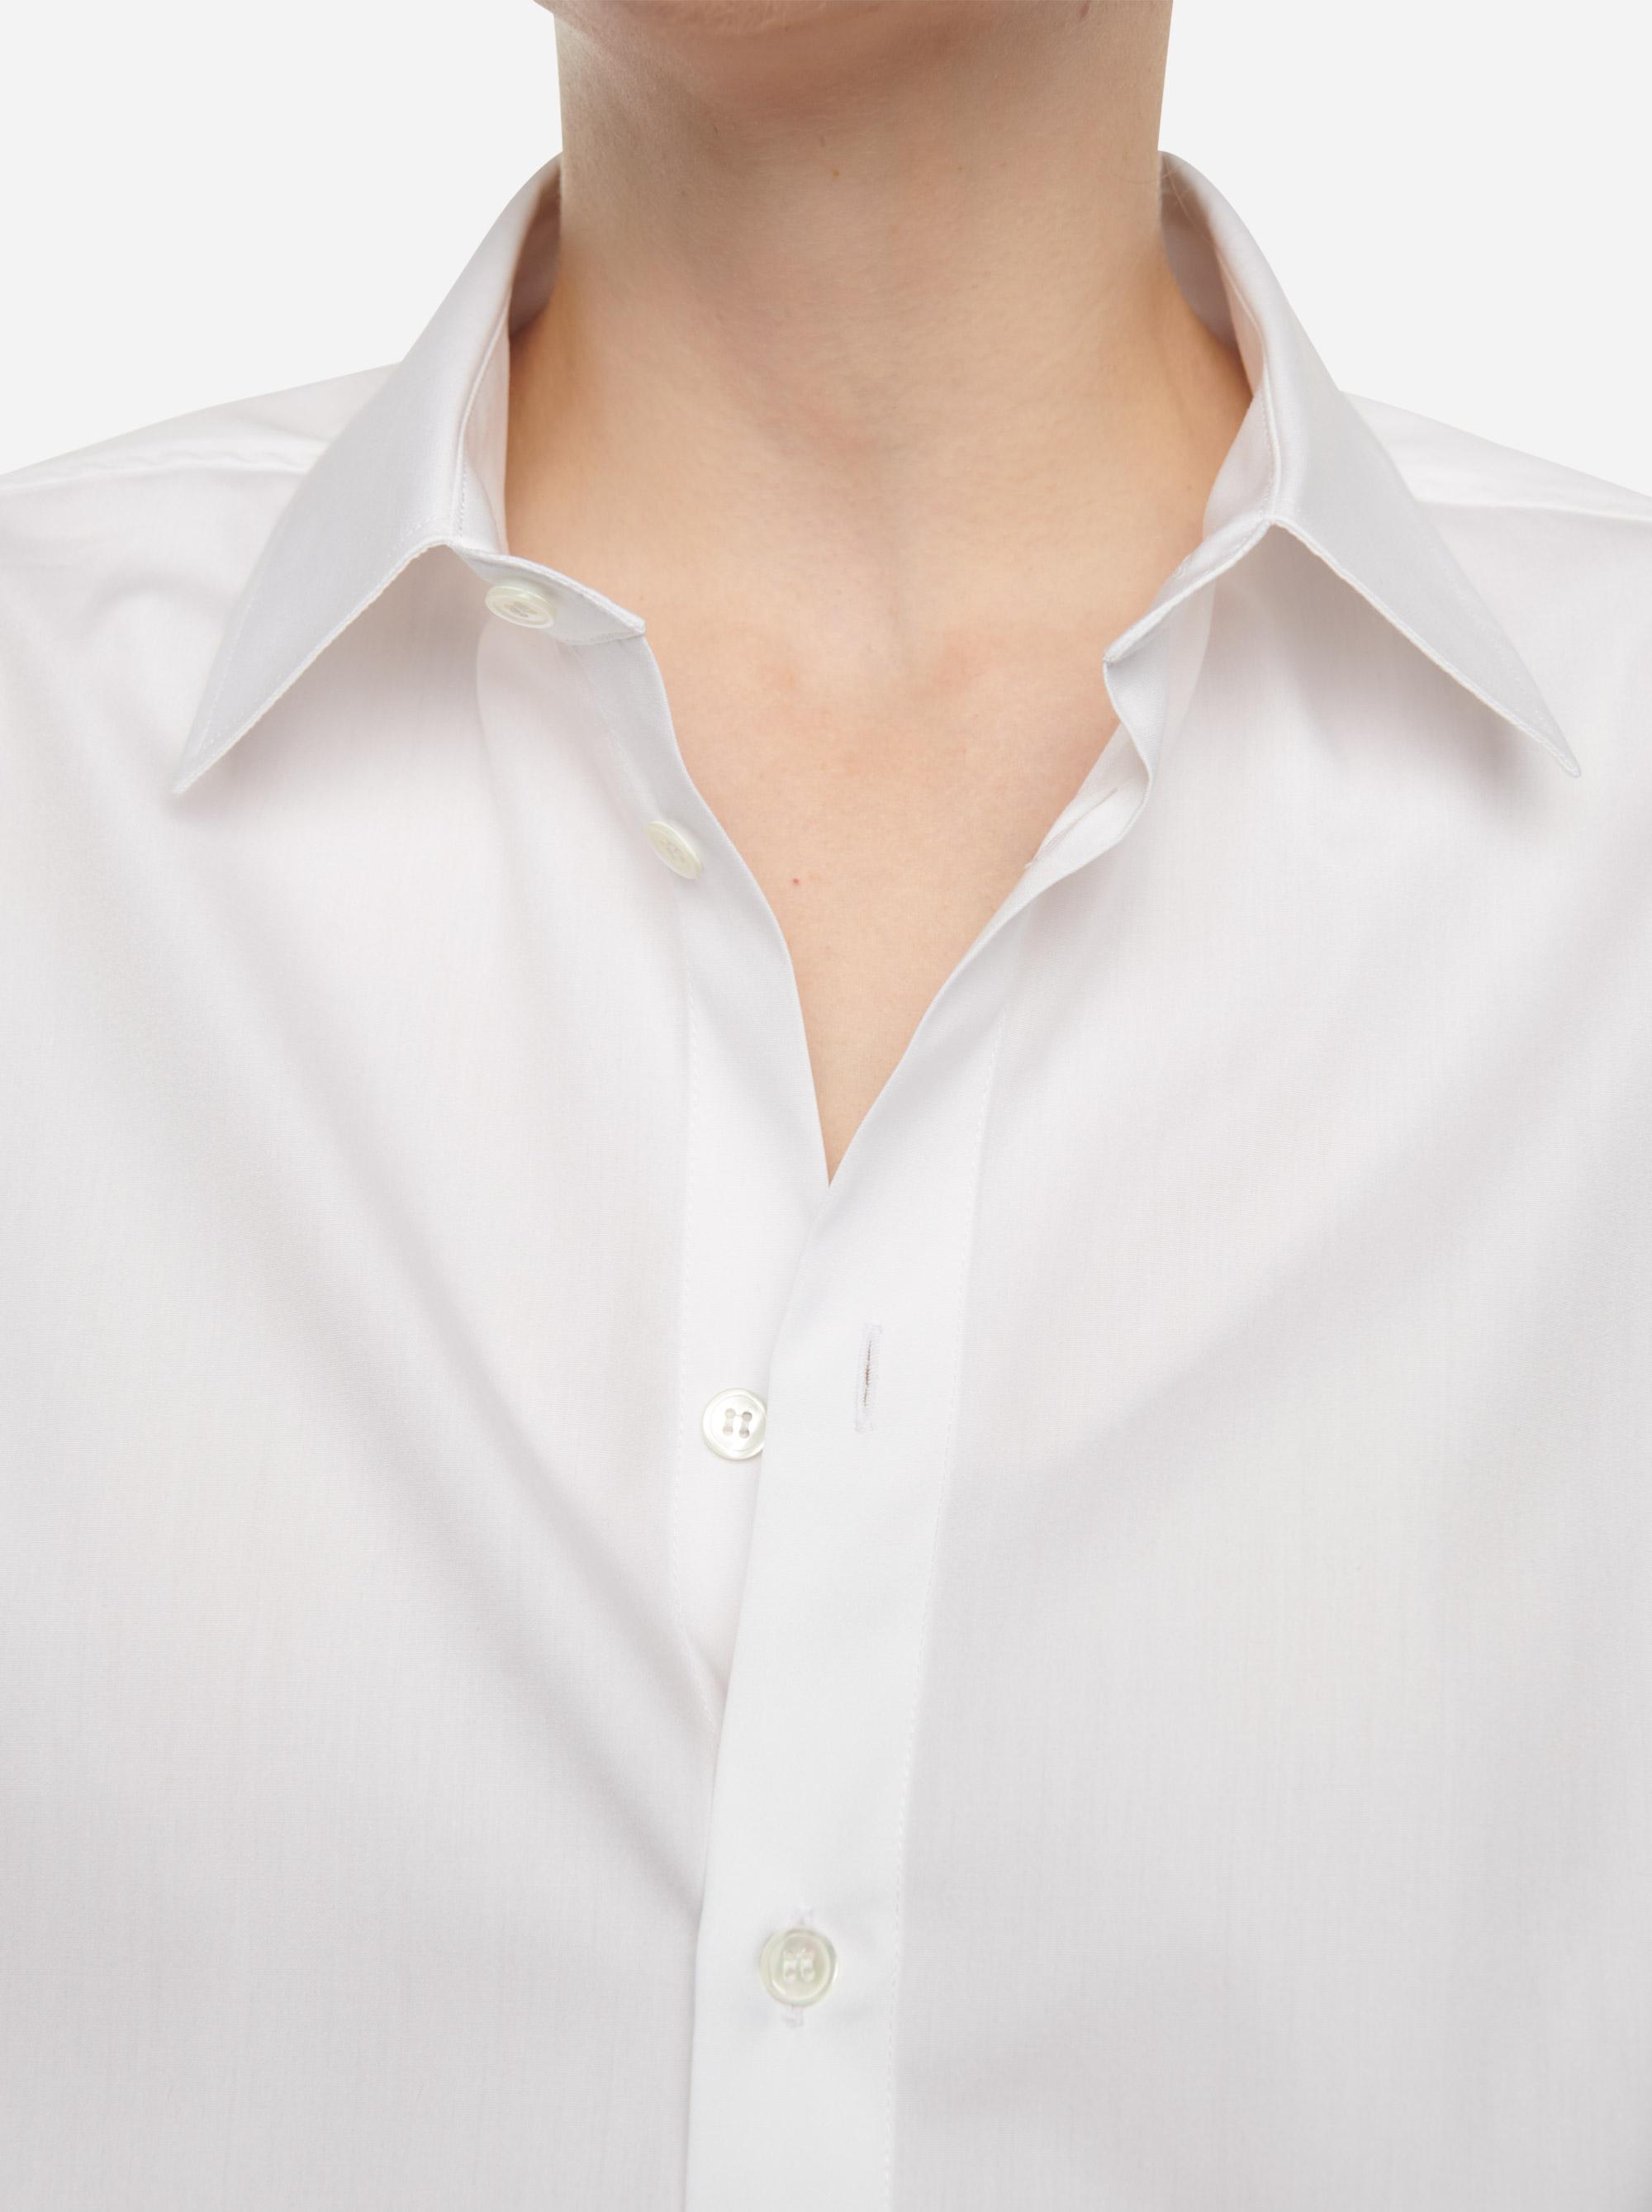 Teym-Shirt-White-women-mens-1